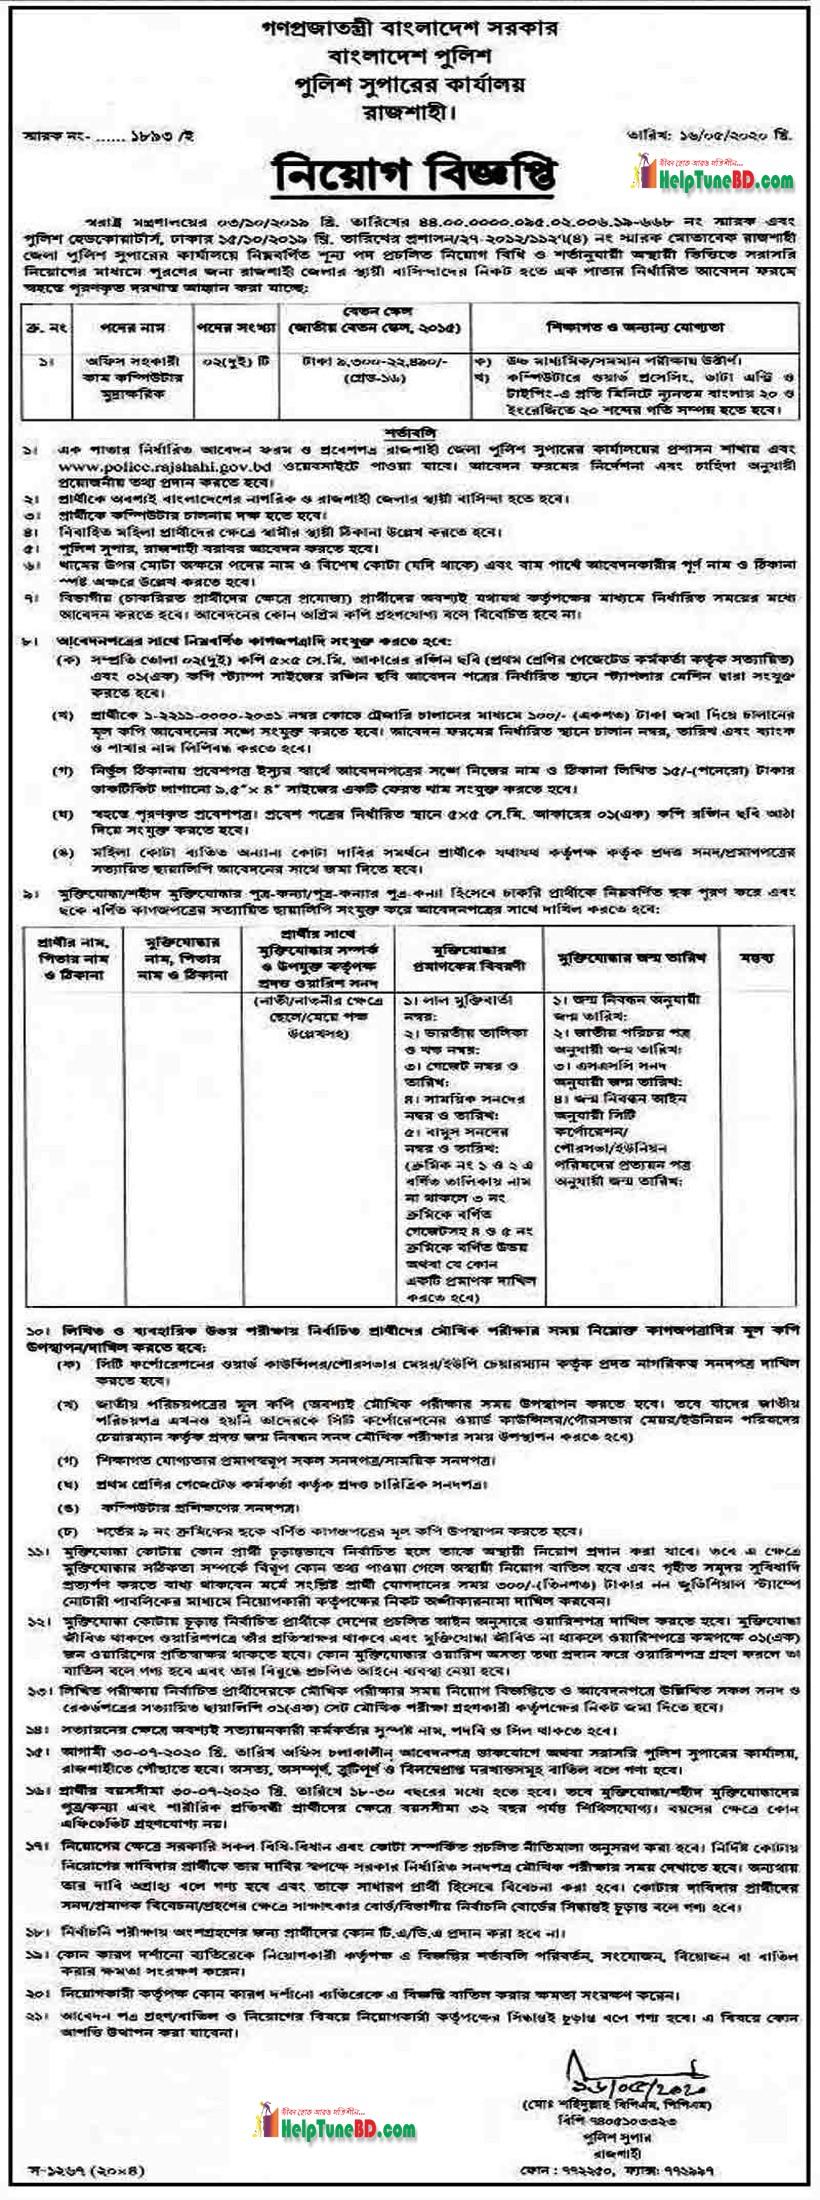 Bangladesh Police Super Office Job Circular all information